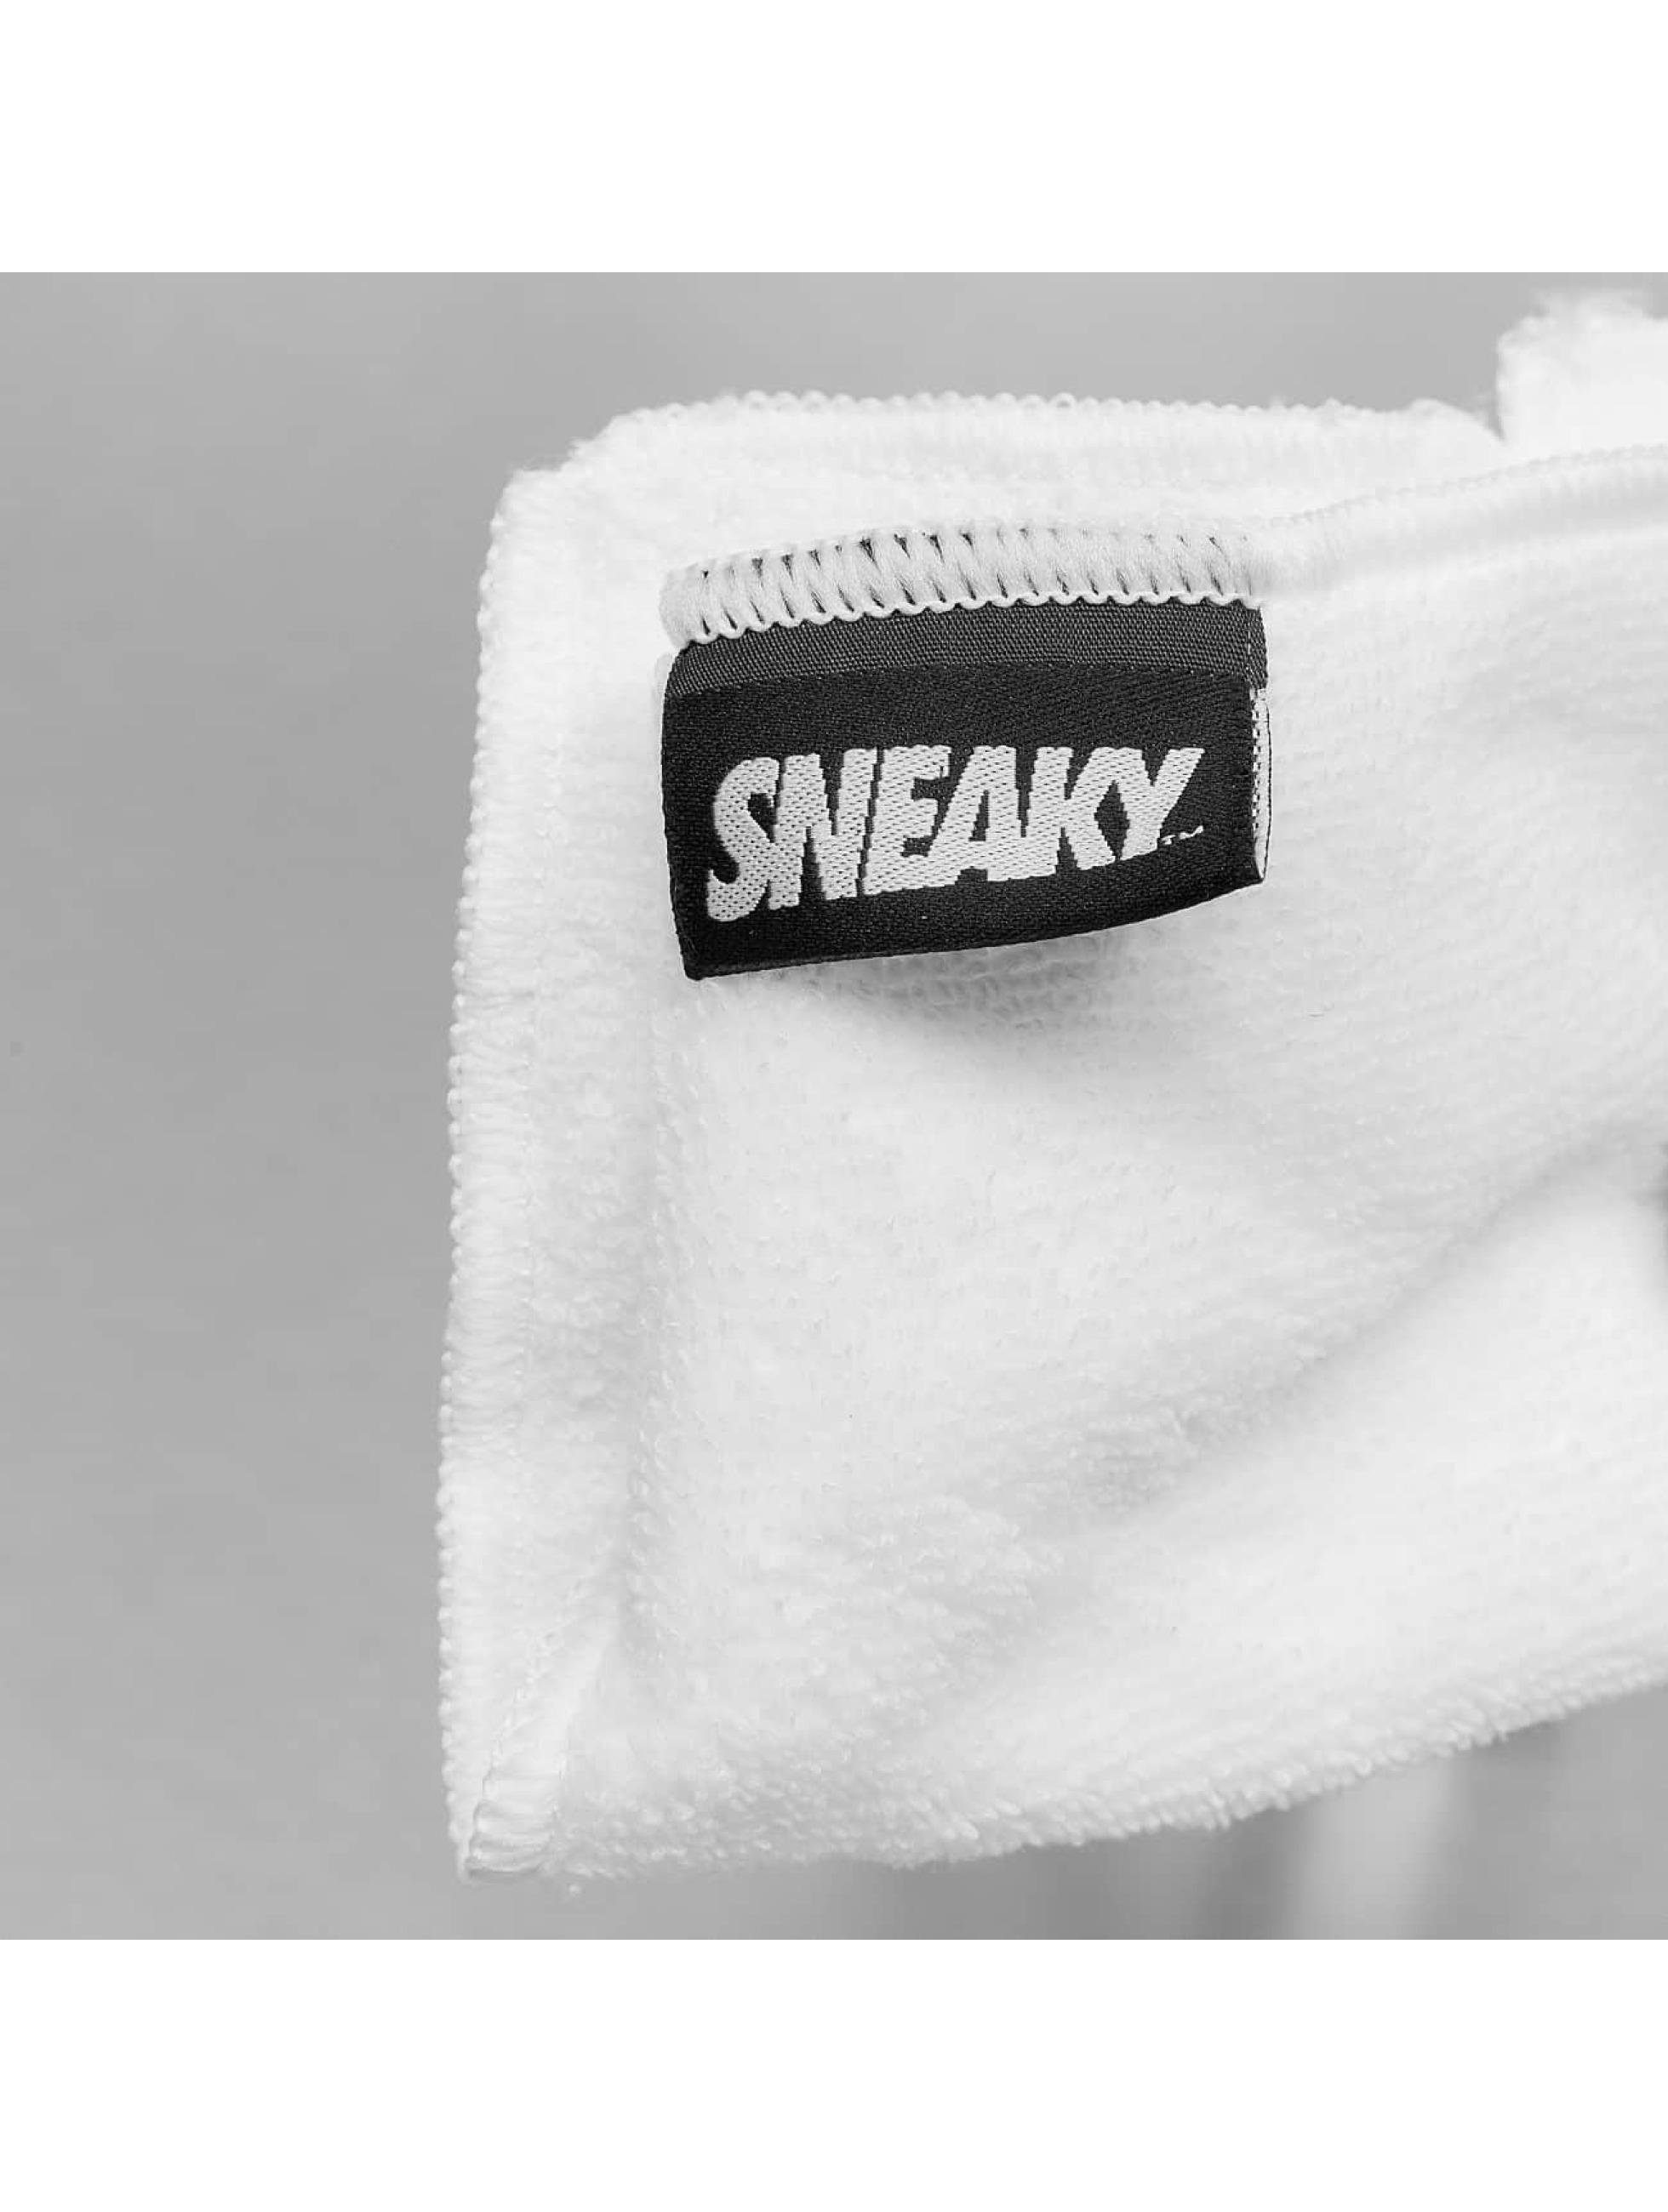 Sneaky Brand Прочее Cleaner Set черный